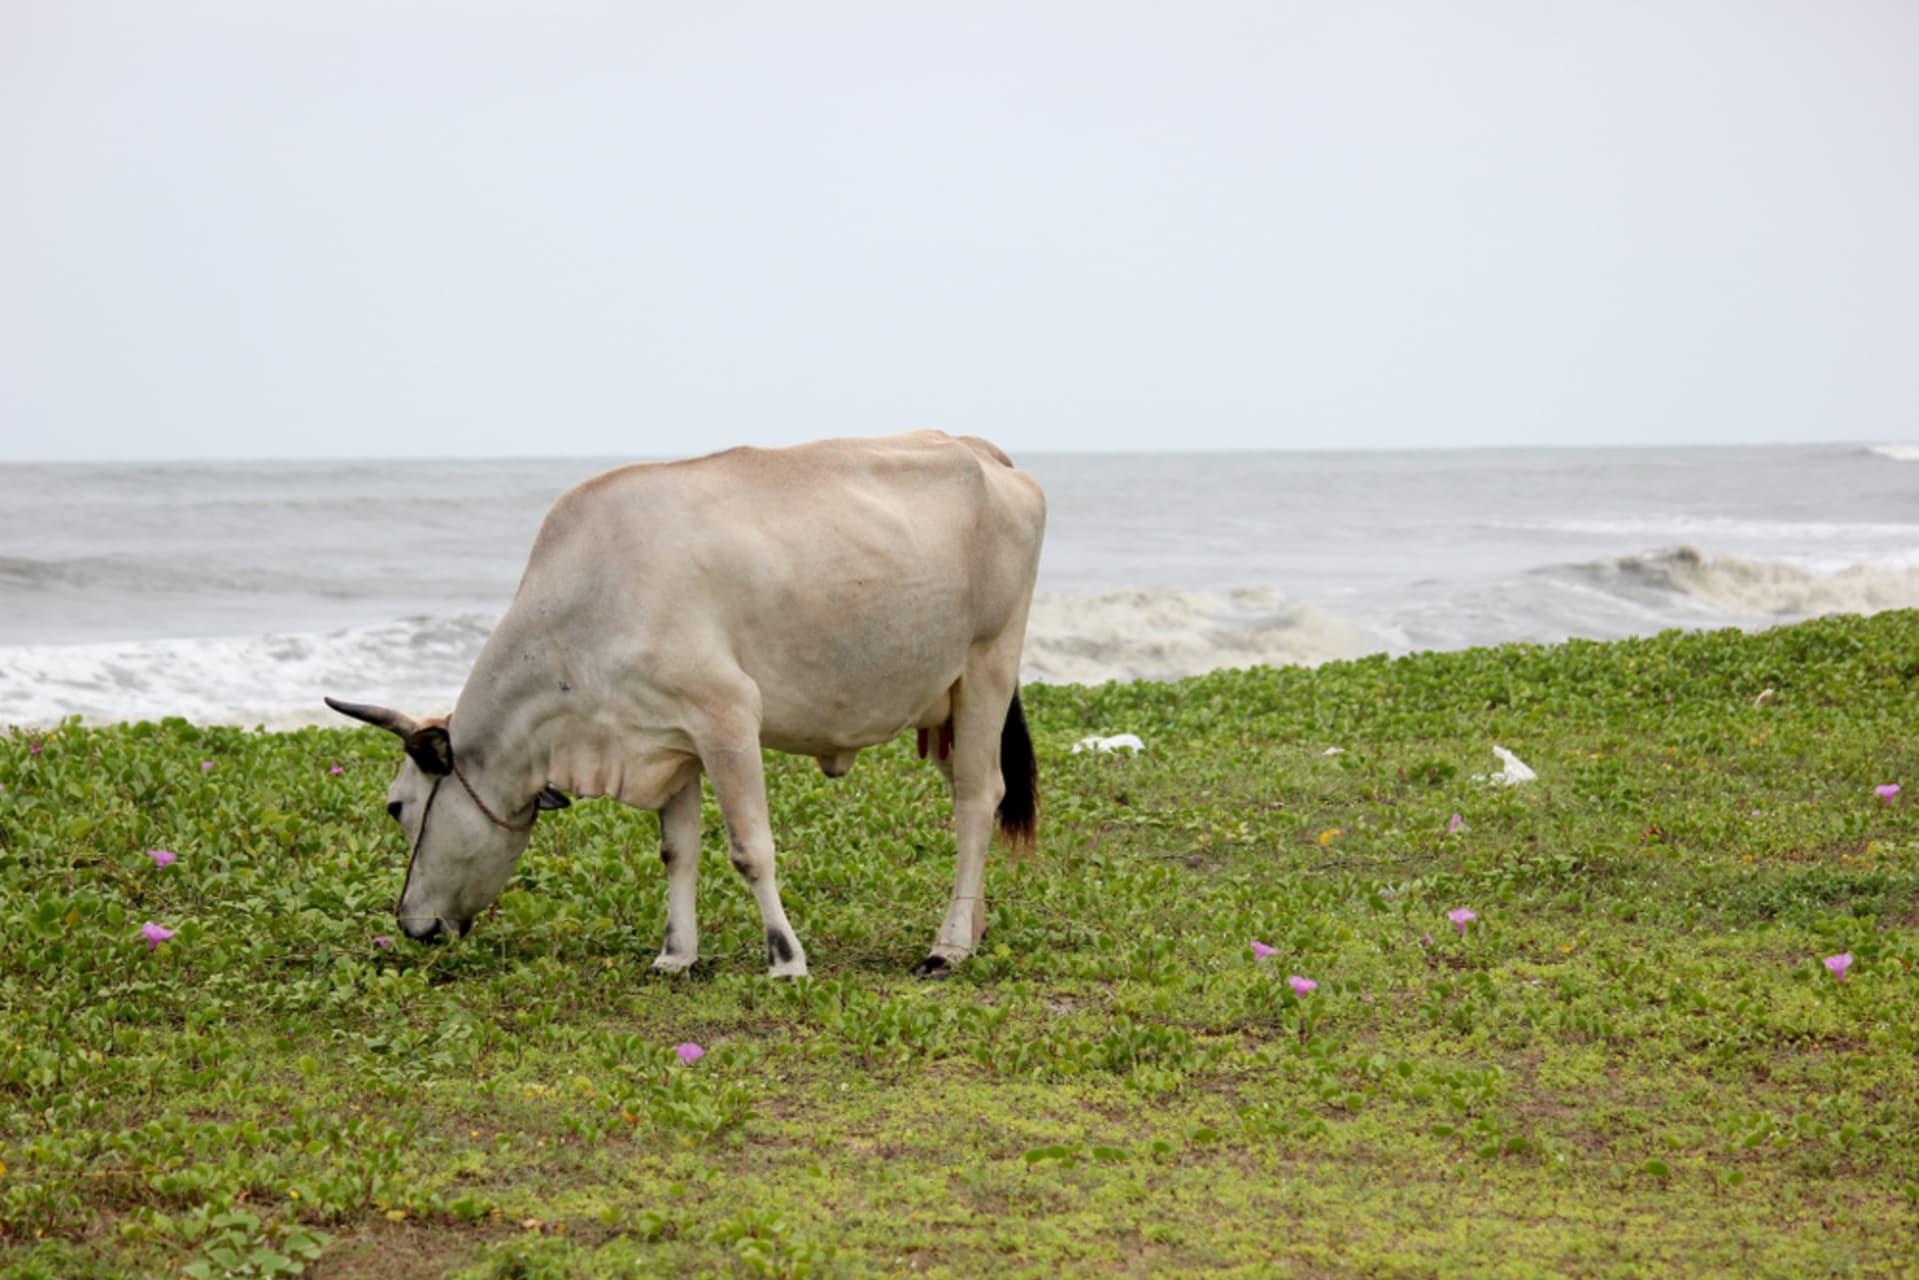 Kerala - Daily Village life of Kerala (Part 2)